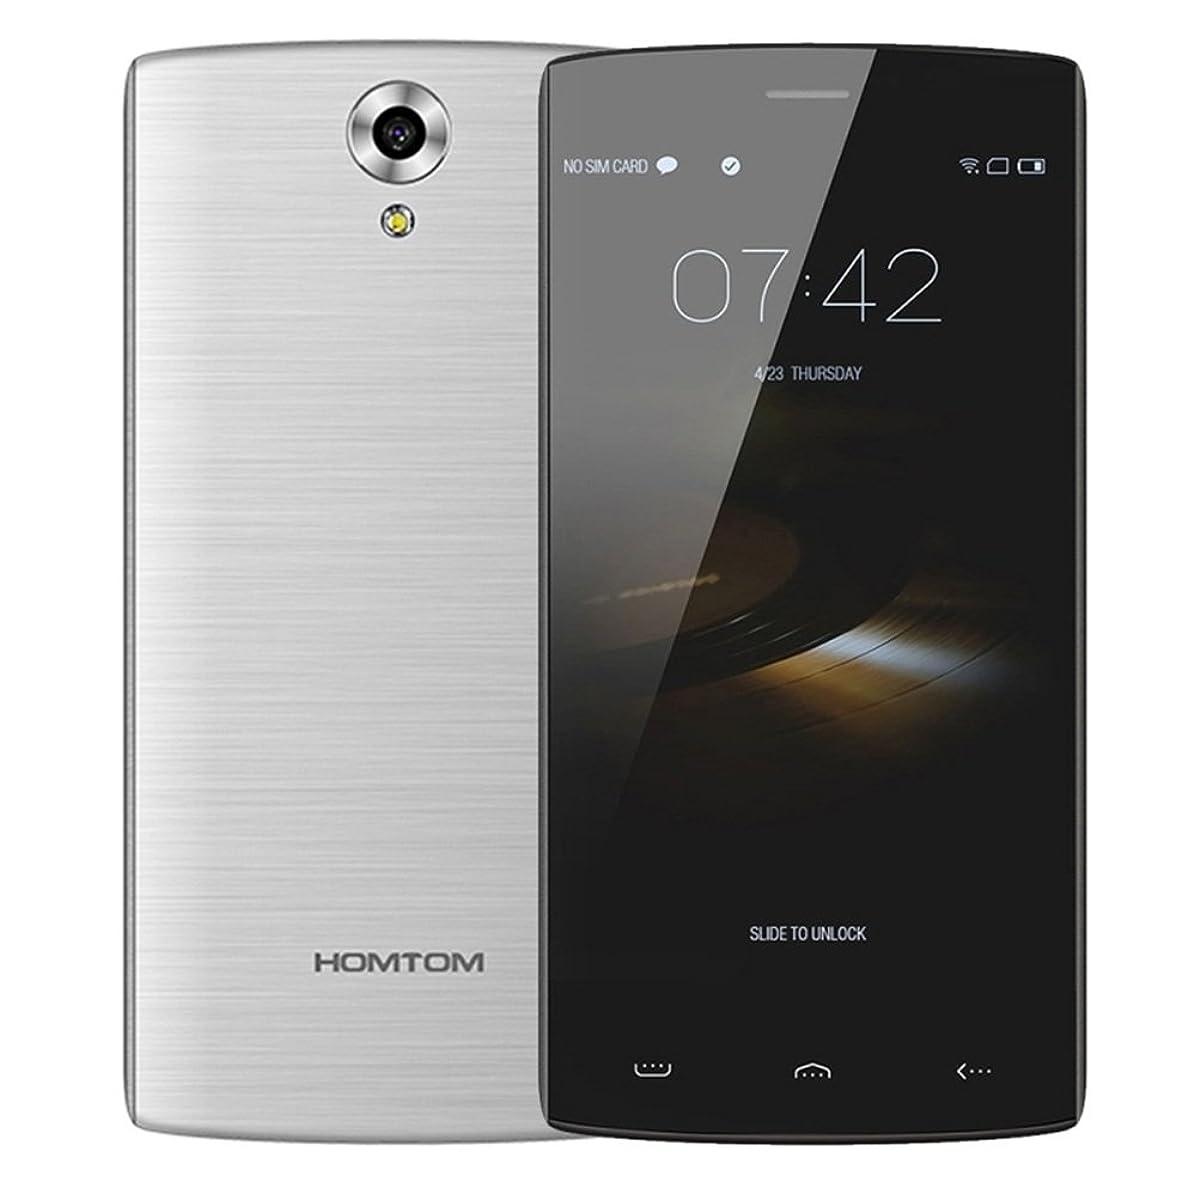 HOMTOM HT7 PRO Dual SIM 5.5 inch Unlocked Phone Android 5.1 2GB+16GB Network: 4G Smart Phone - Black (White)